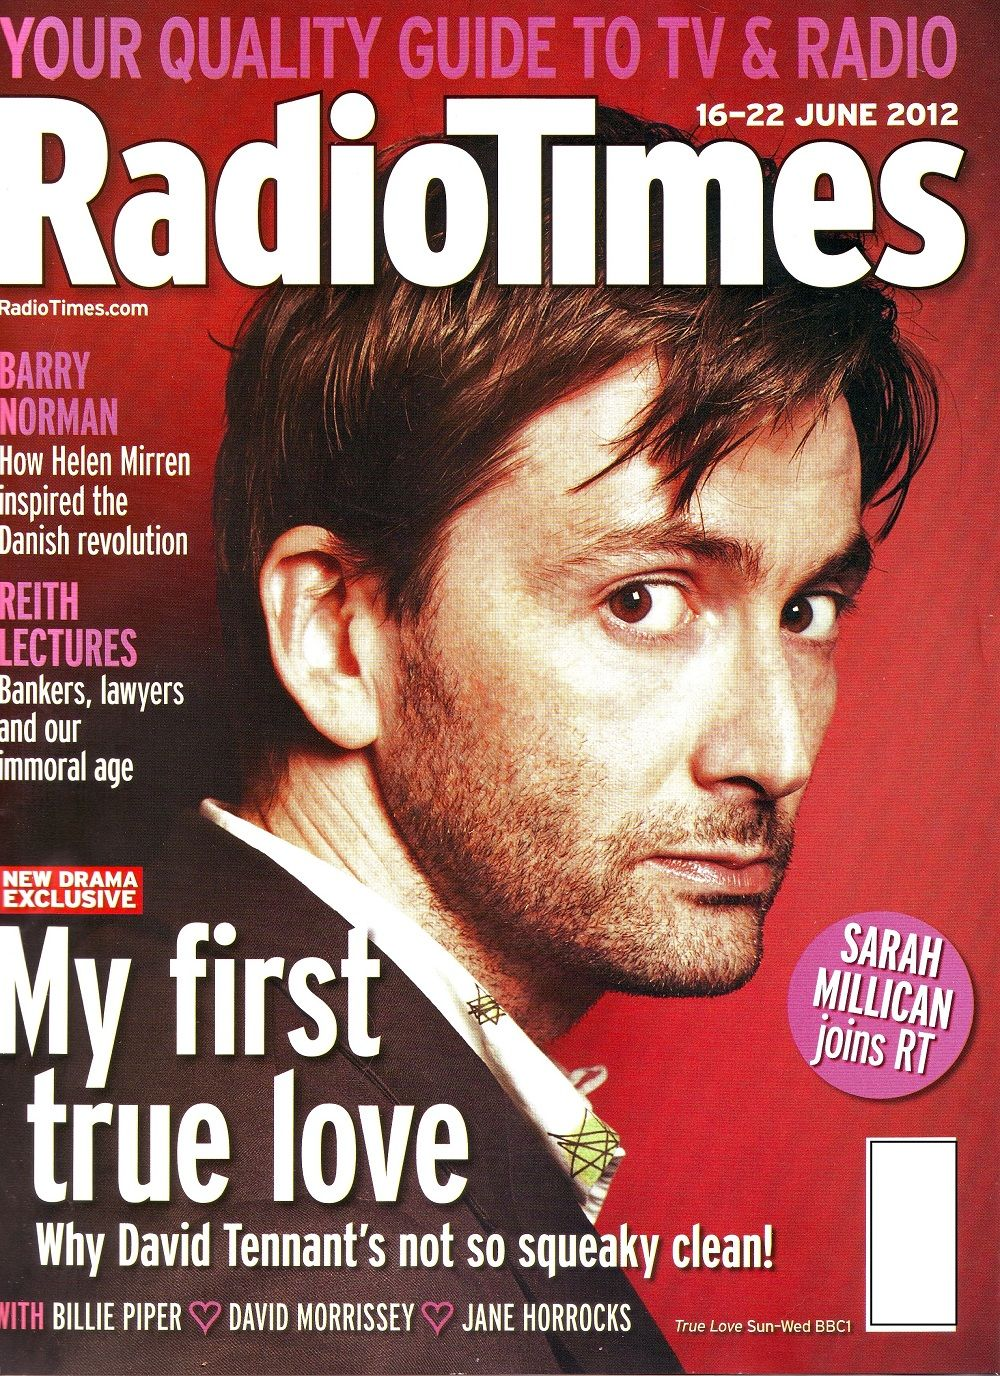 THROWBACK THURSDAY 'My First True Love' David Tennant